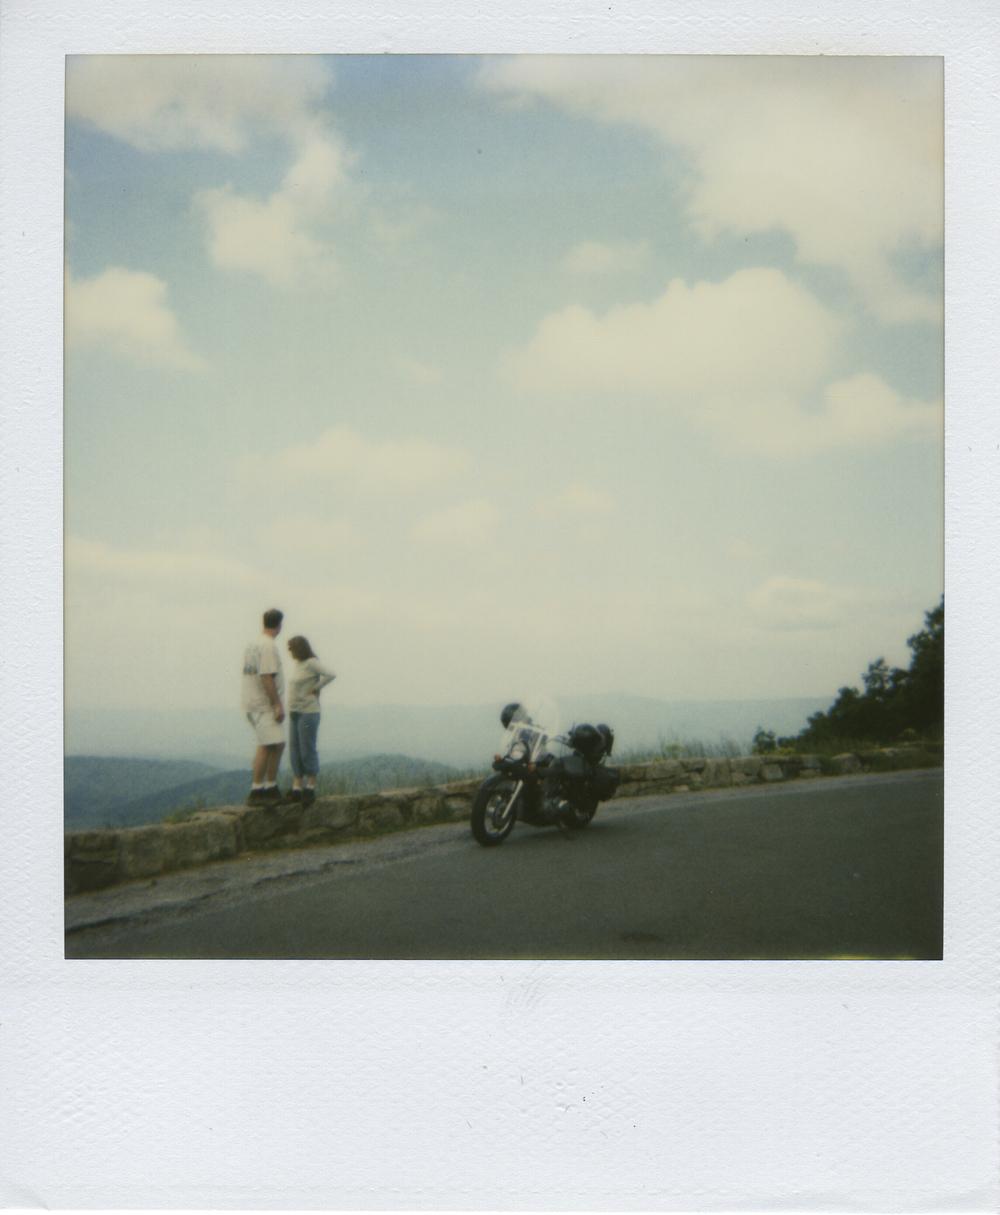 jlaurence-polaroid-018.jpg